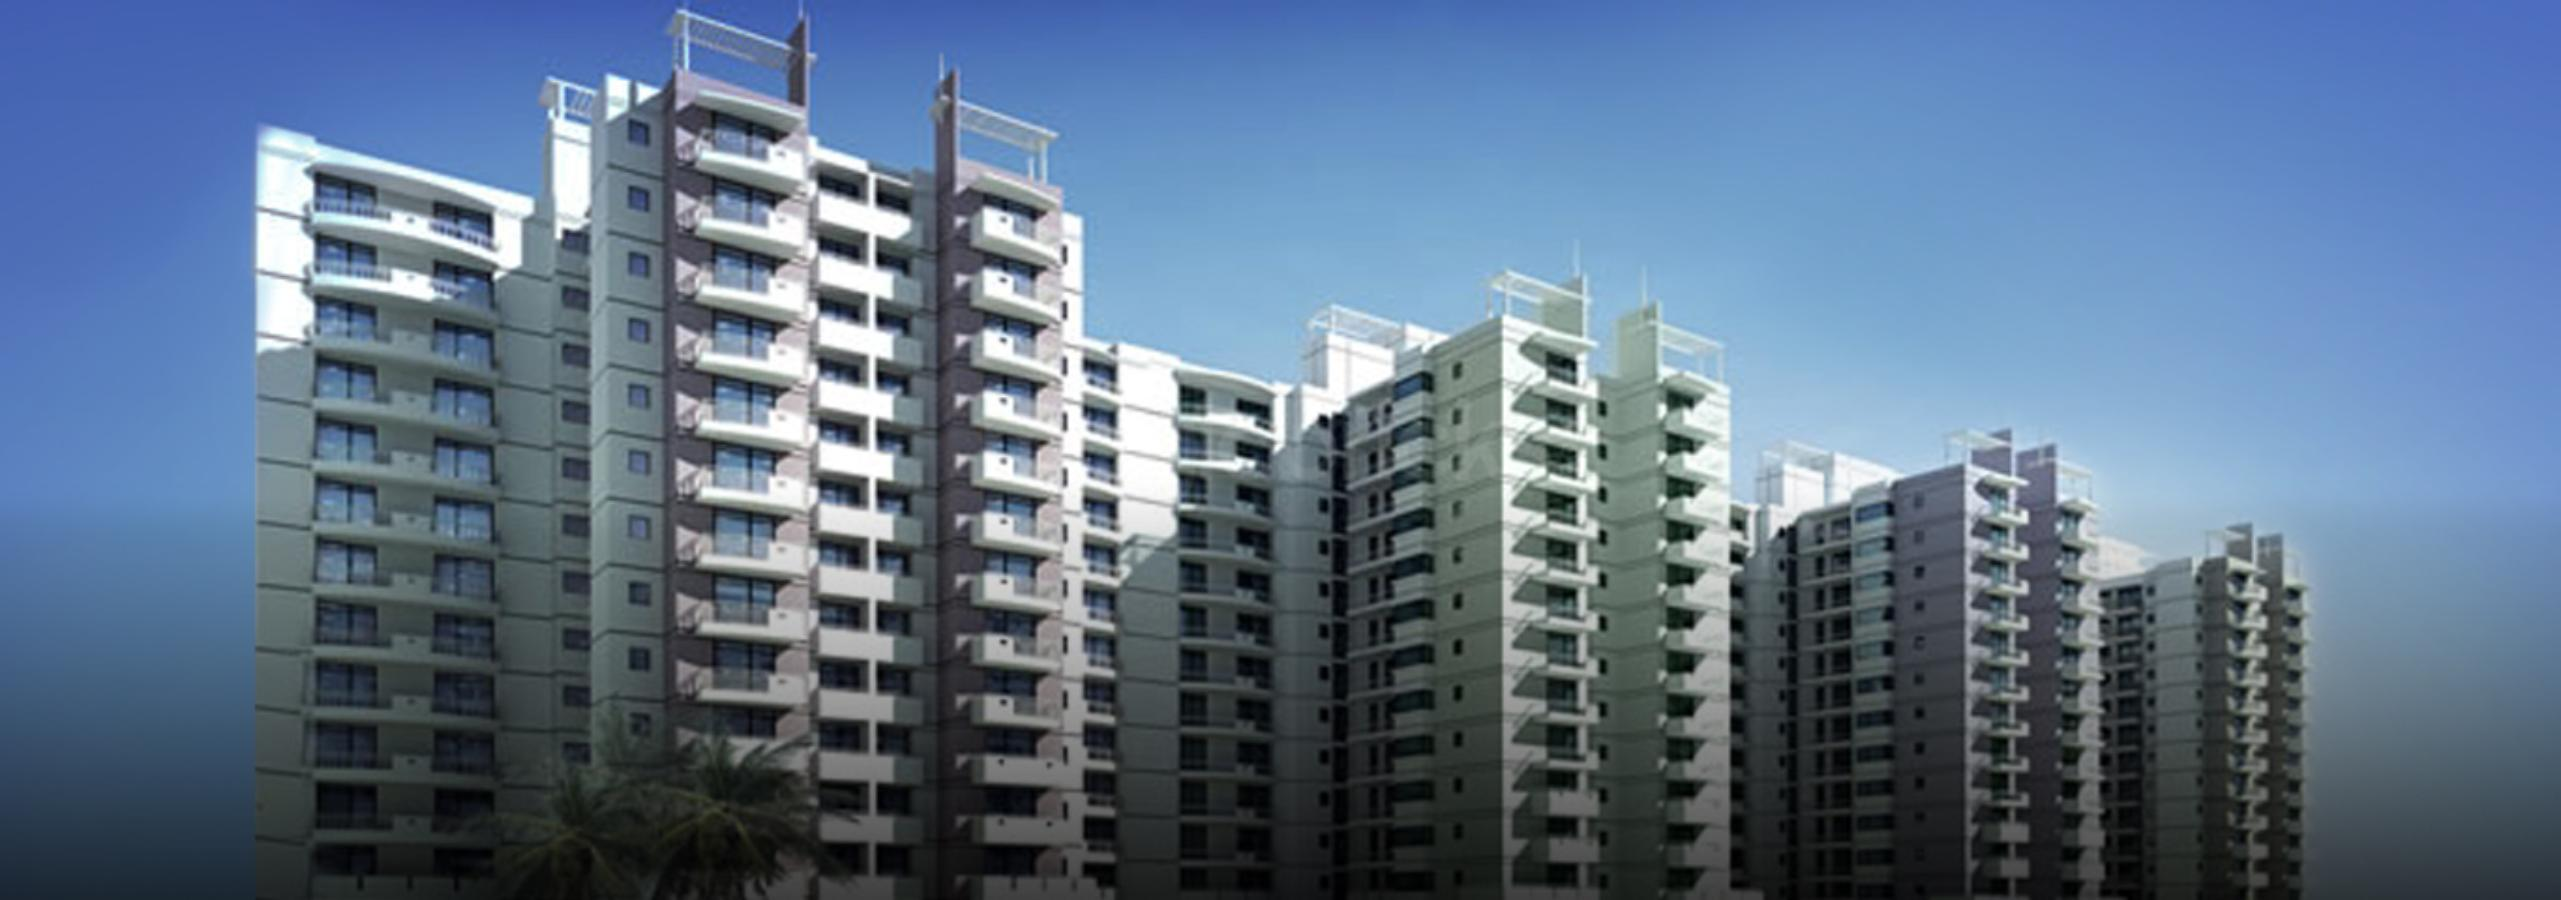 Aditya Celebrity Homes, Sector 76, Dadri Road, Noida ...